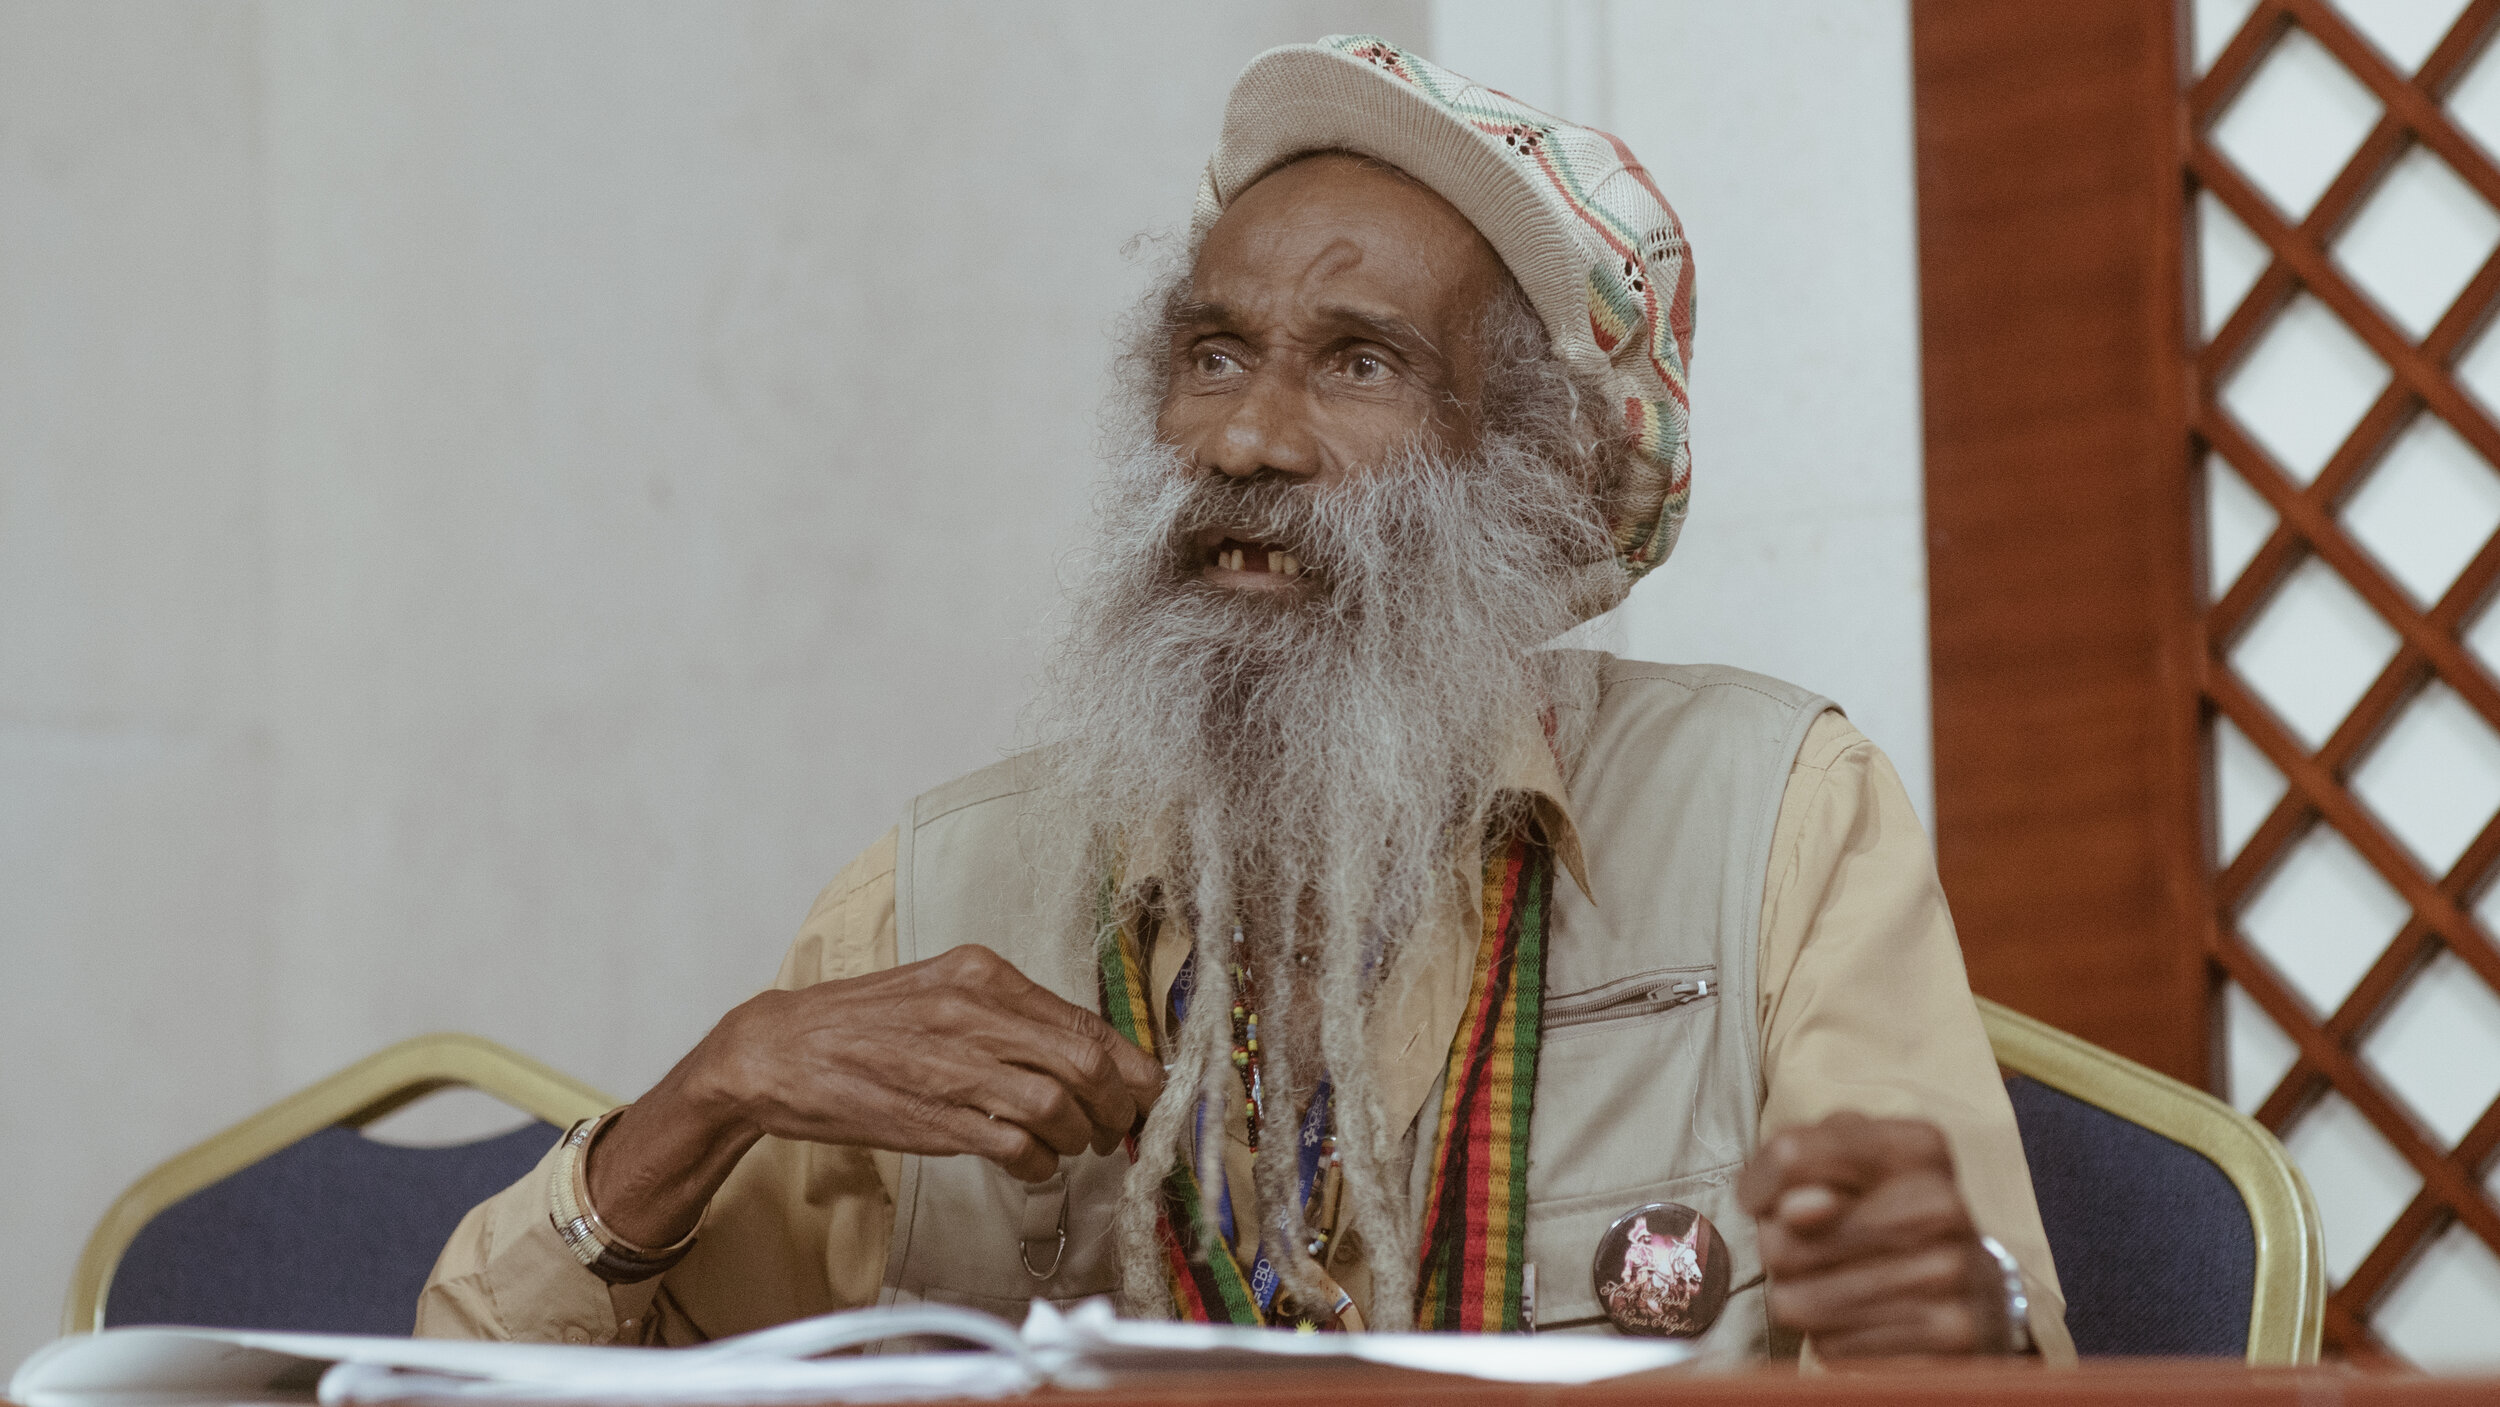 Ambassador Frank I Francis - Rastafari Food For Life